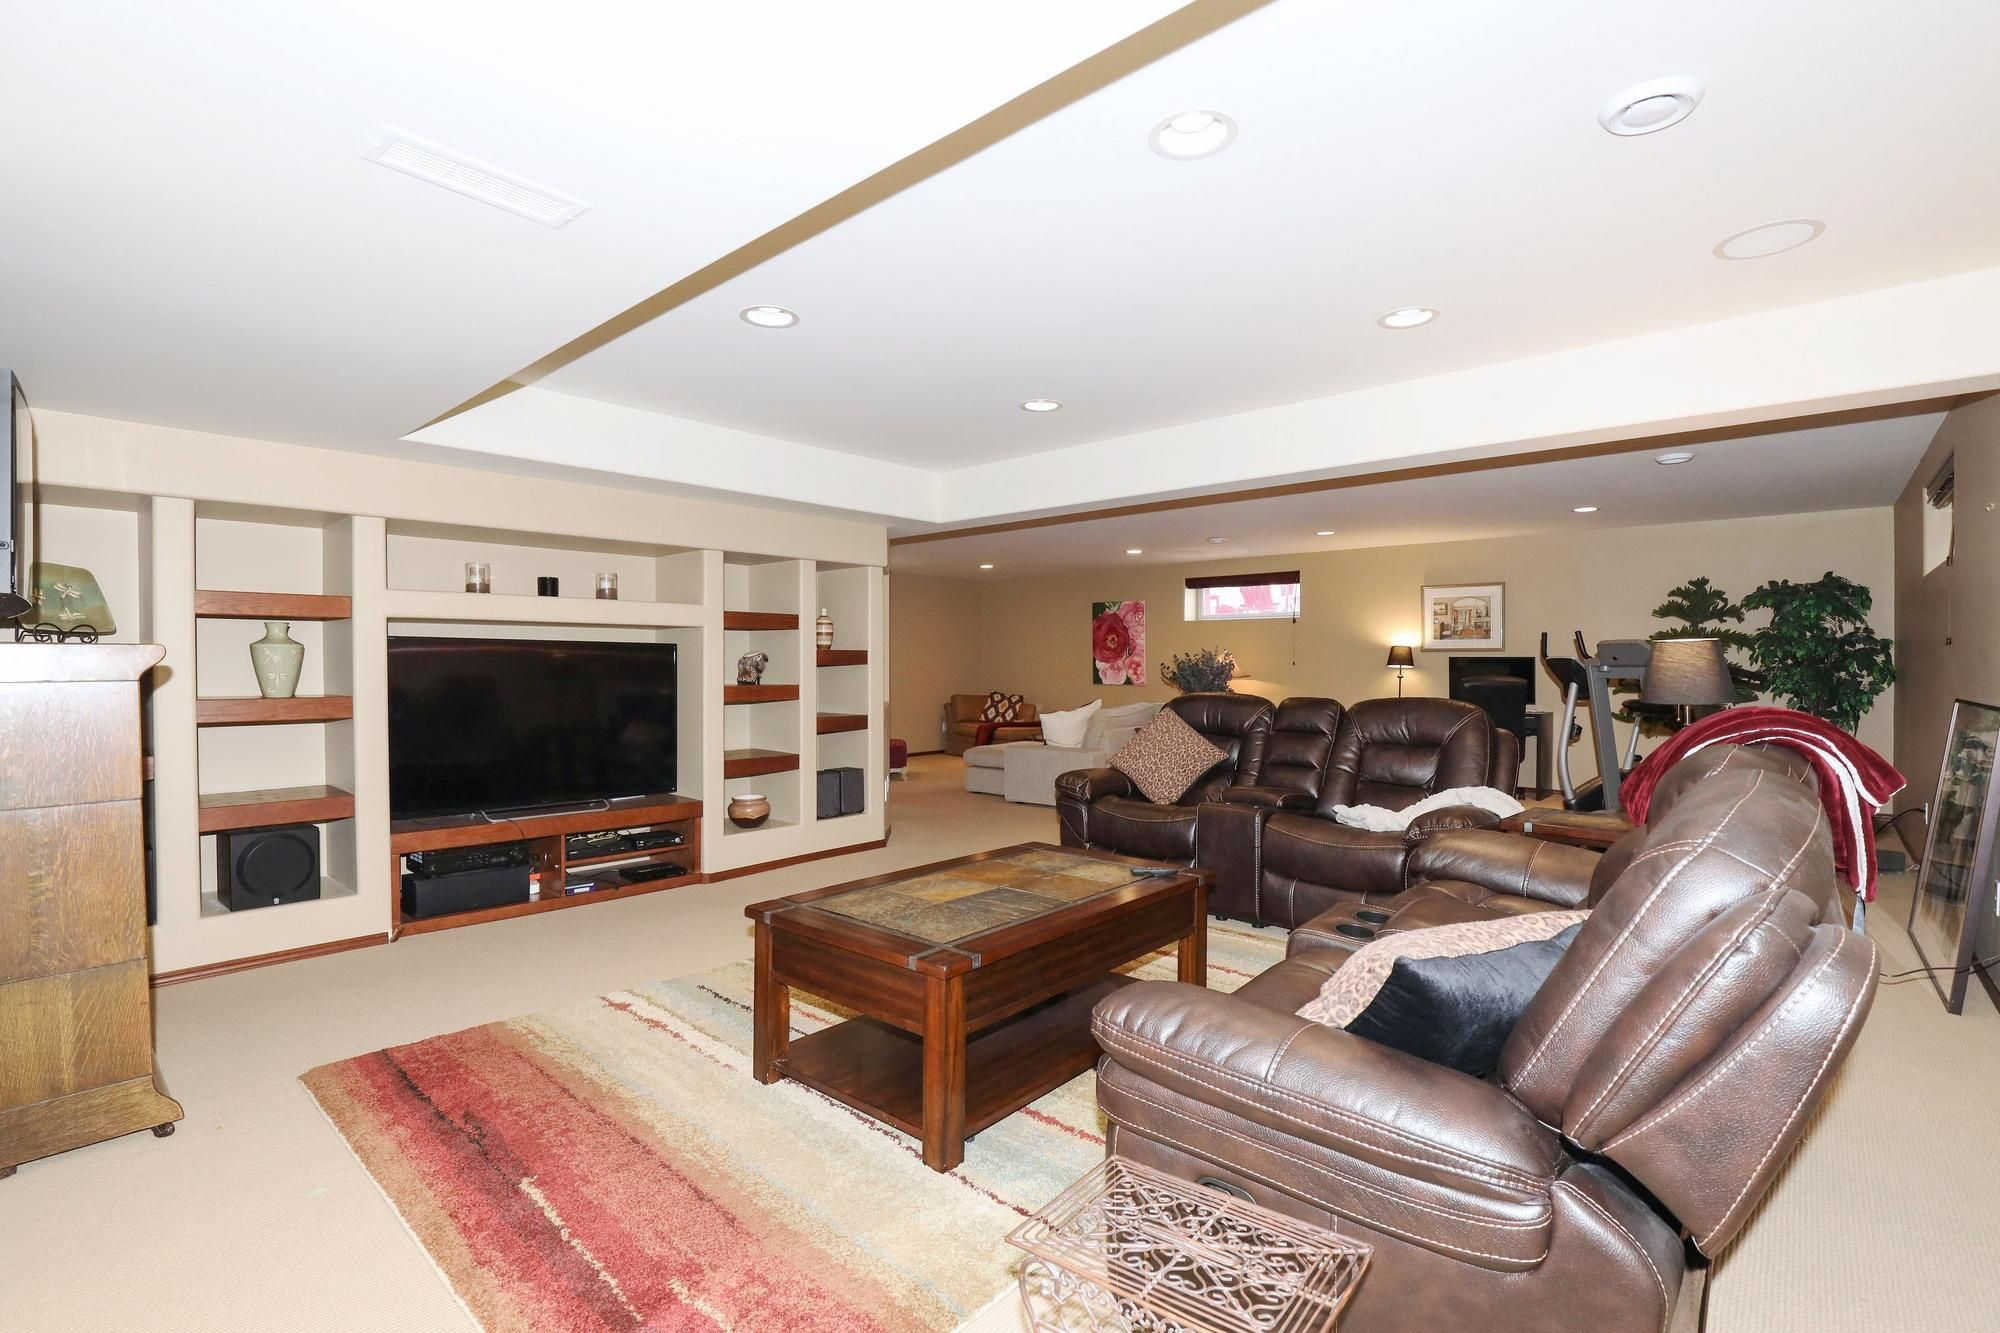 Photo 29: Photos: 7 Castle Ridge Drive in Winnipeg: Linden Ridge Single Family Detached for sale (1M)  : MLS®# 202107901